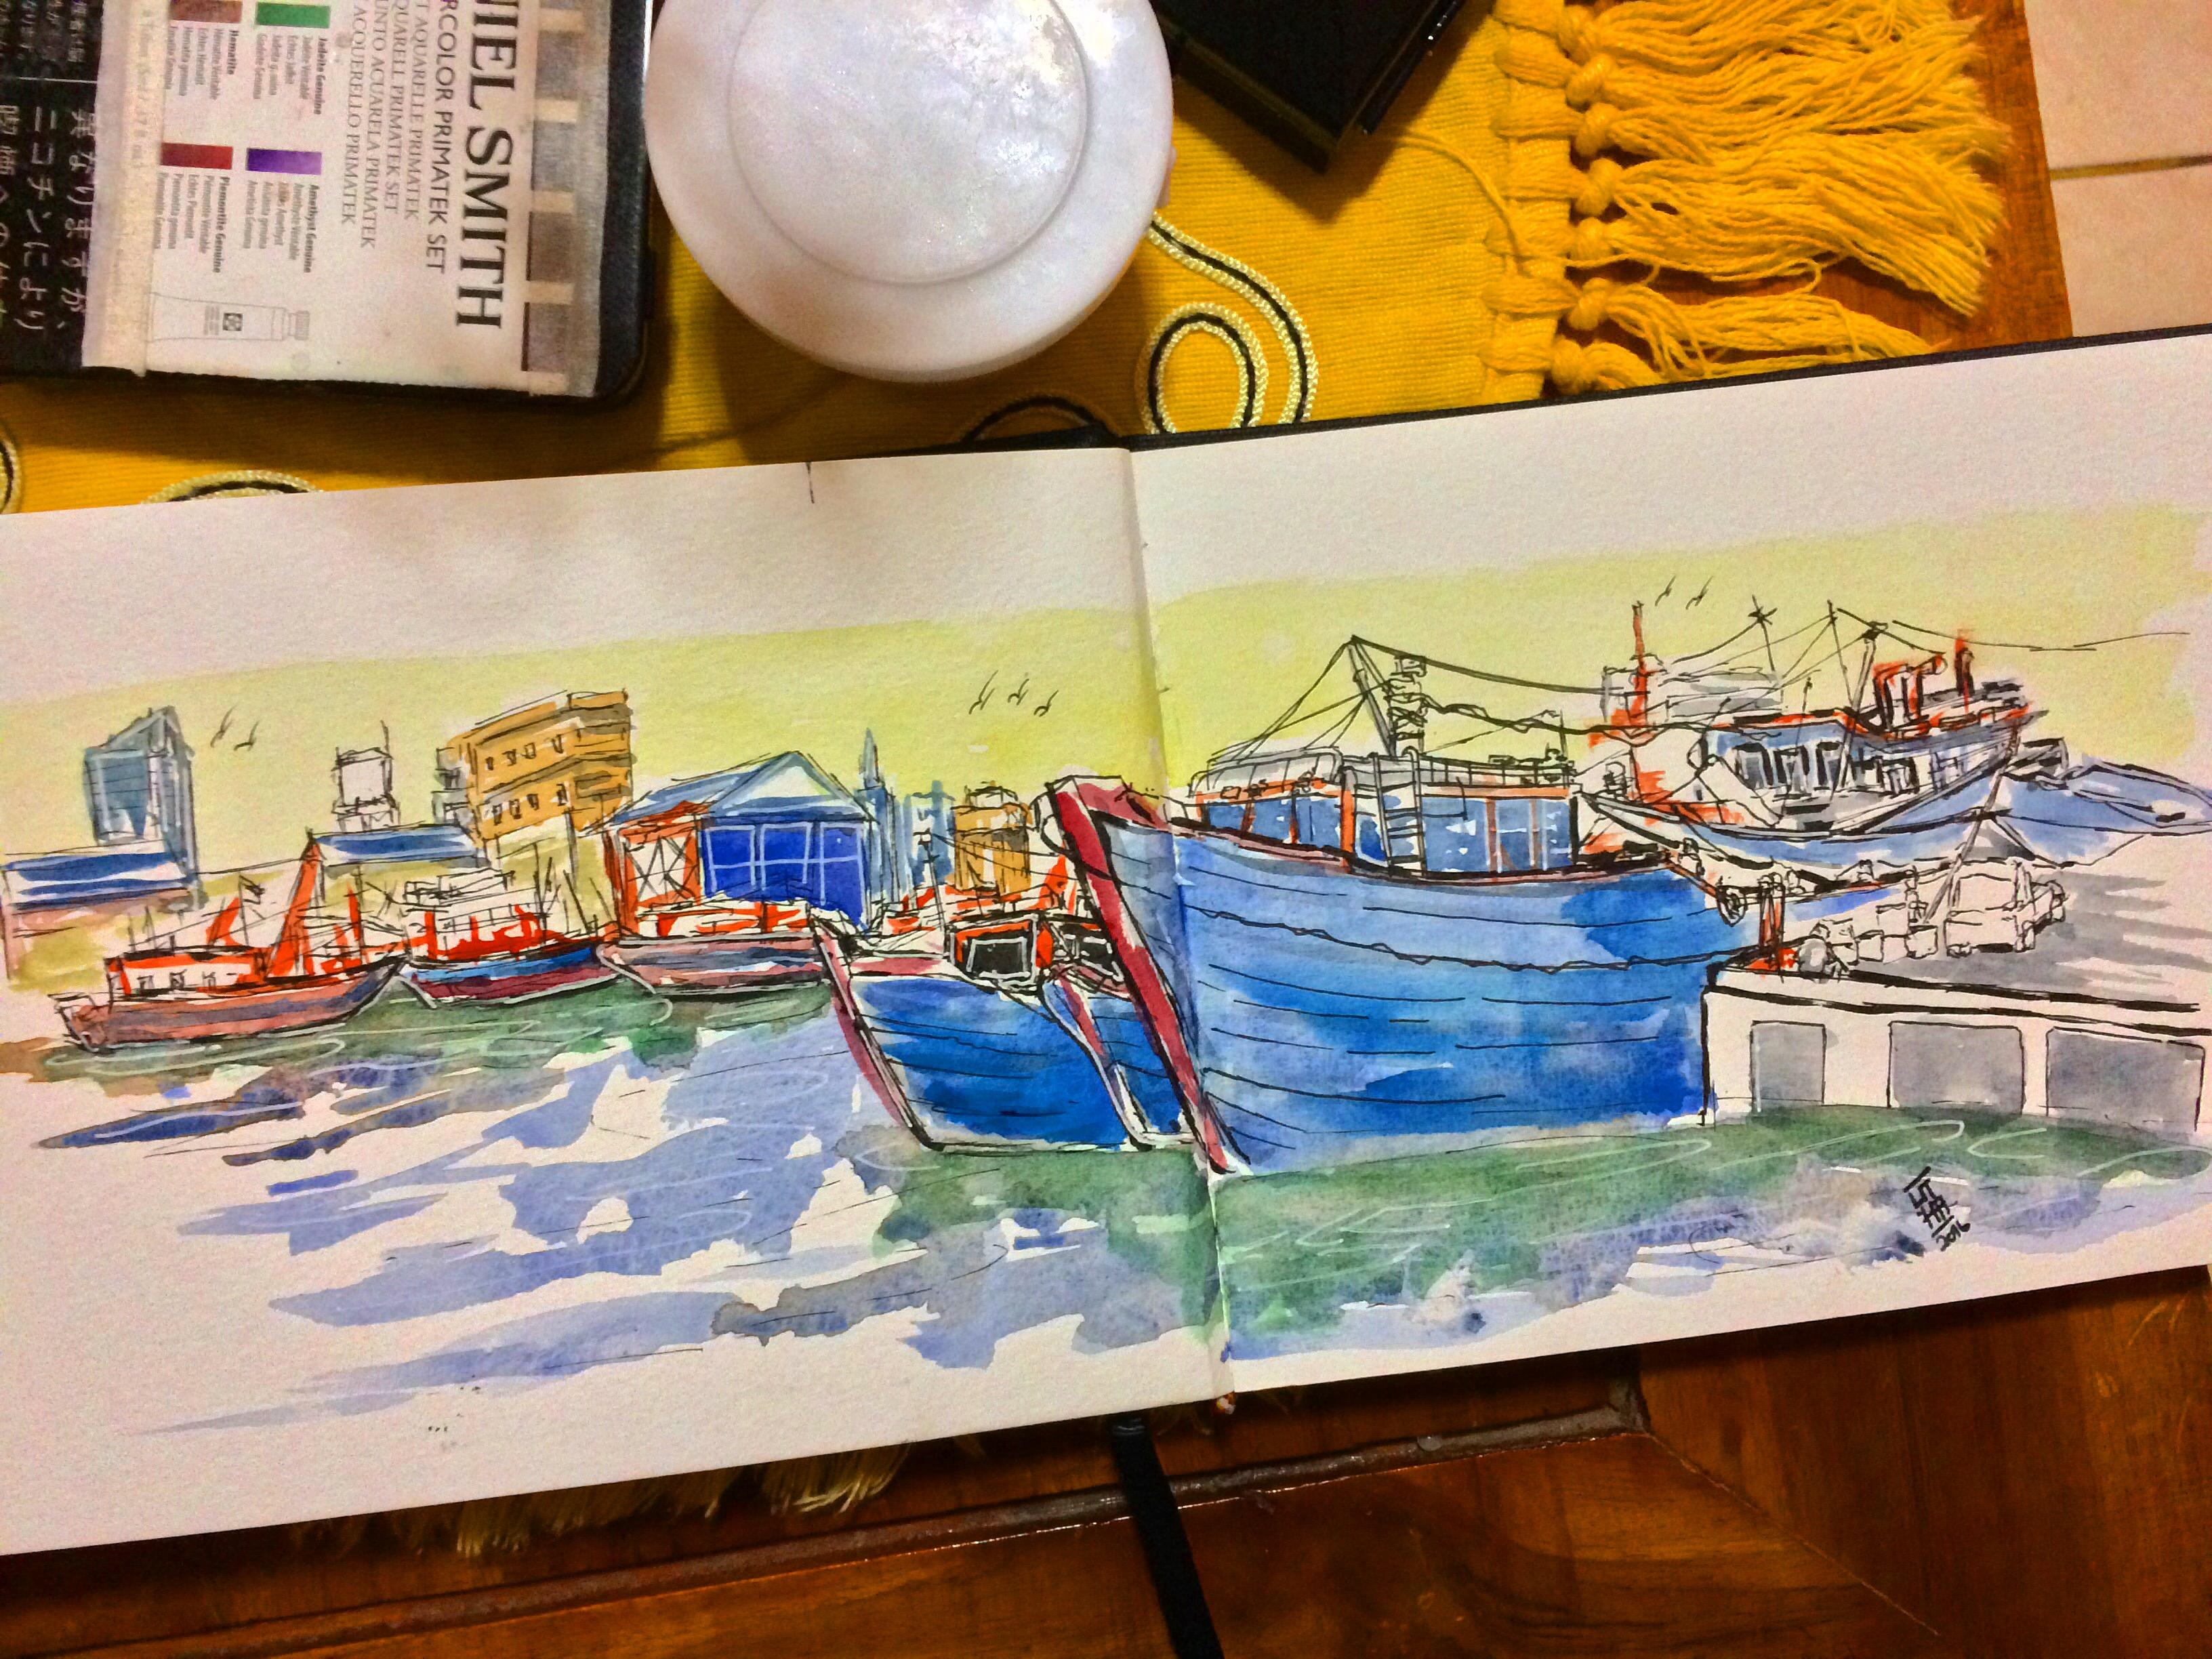 #WorldWatercolorGroup - Watercolor painting by Utha (Anak Agung Wira Suputra) - #doodlewash